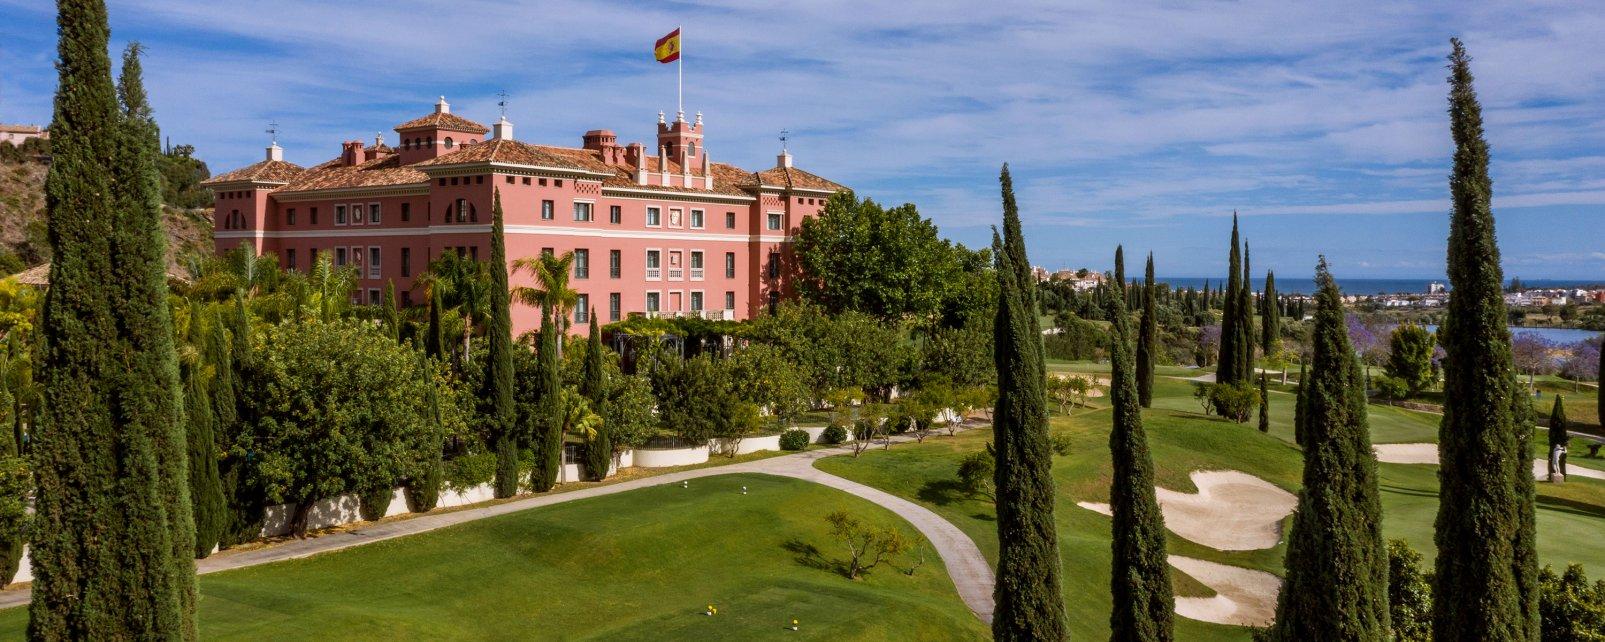 Hotel Anantara Villa Padierna Palace Benahavis Marbella Resort